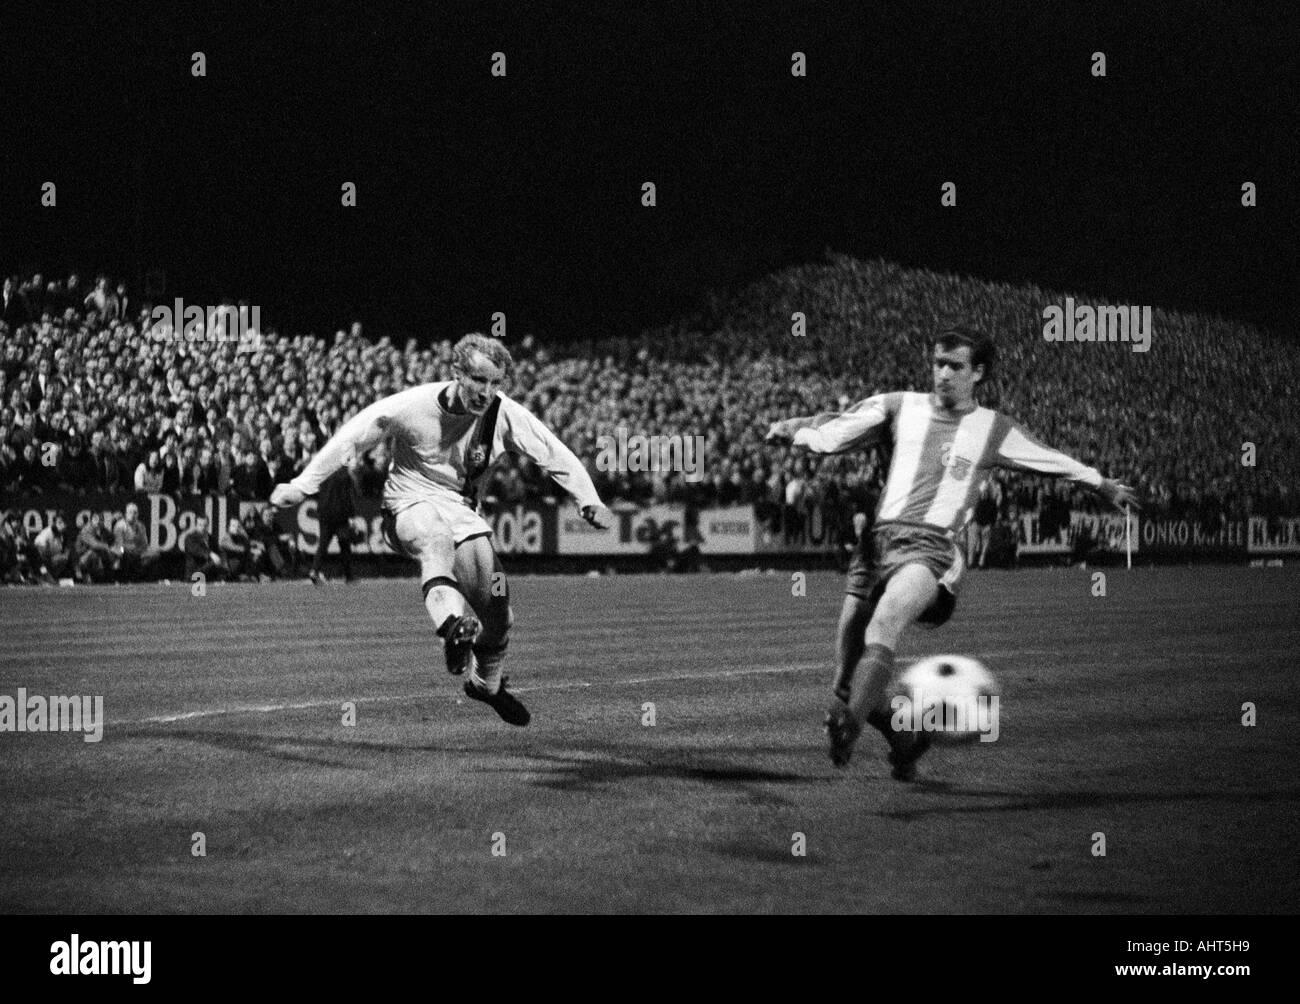 football, Bundesliga, 1970/1971, Borussia Moenchengladbach versus FC Bayern Munich 3:1, Boekelberg Stadium, scene of the match, duel between Berti Vogts (MG) left and Peter Pumm (FCB) right - Stock Image